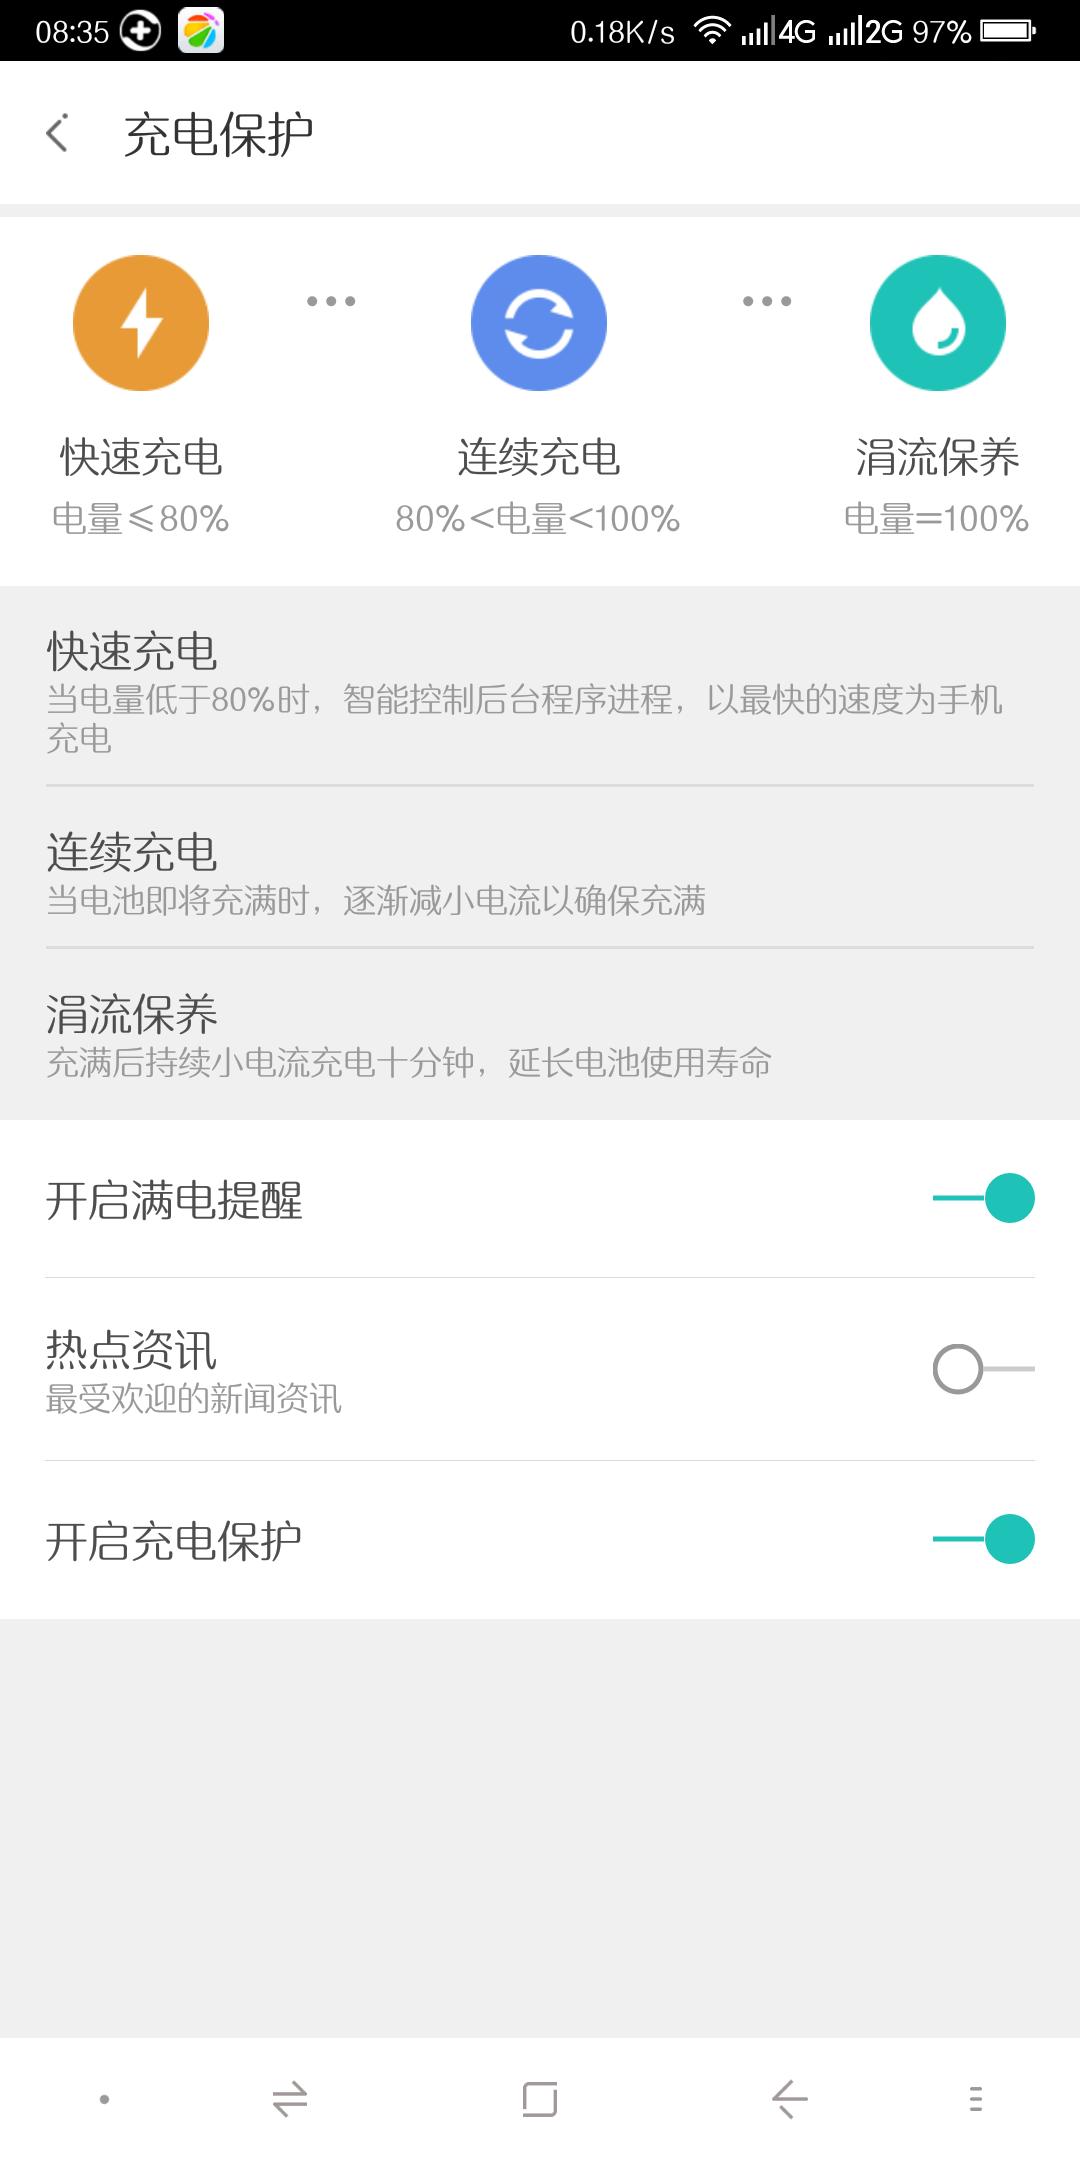 Screenshot_2018-12-04-08-35-04.png